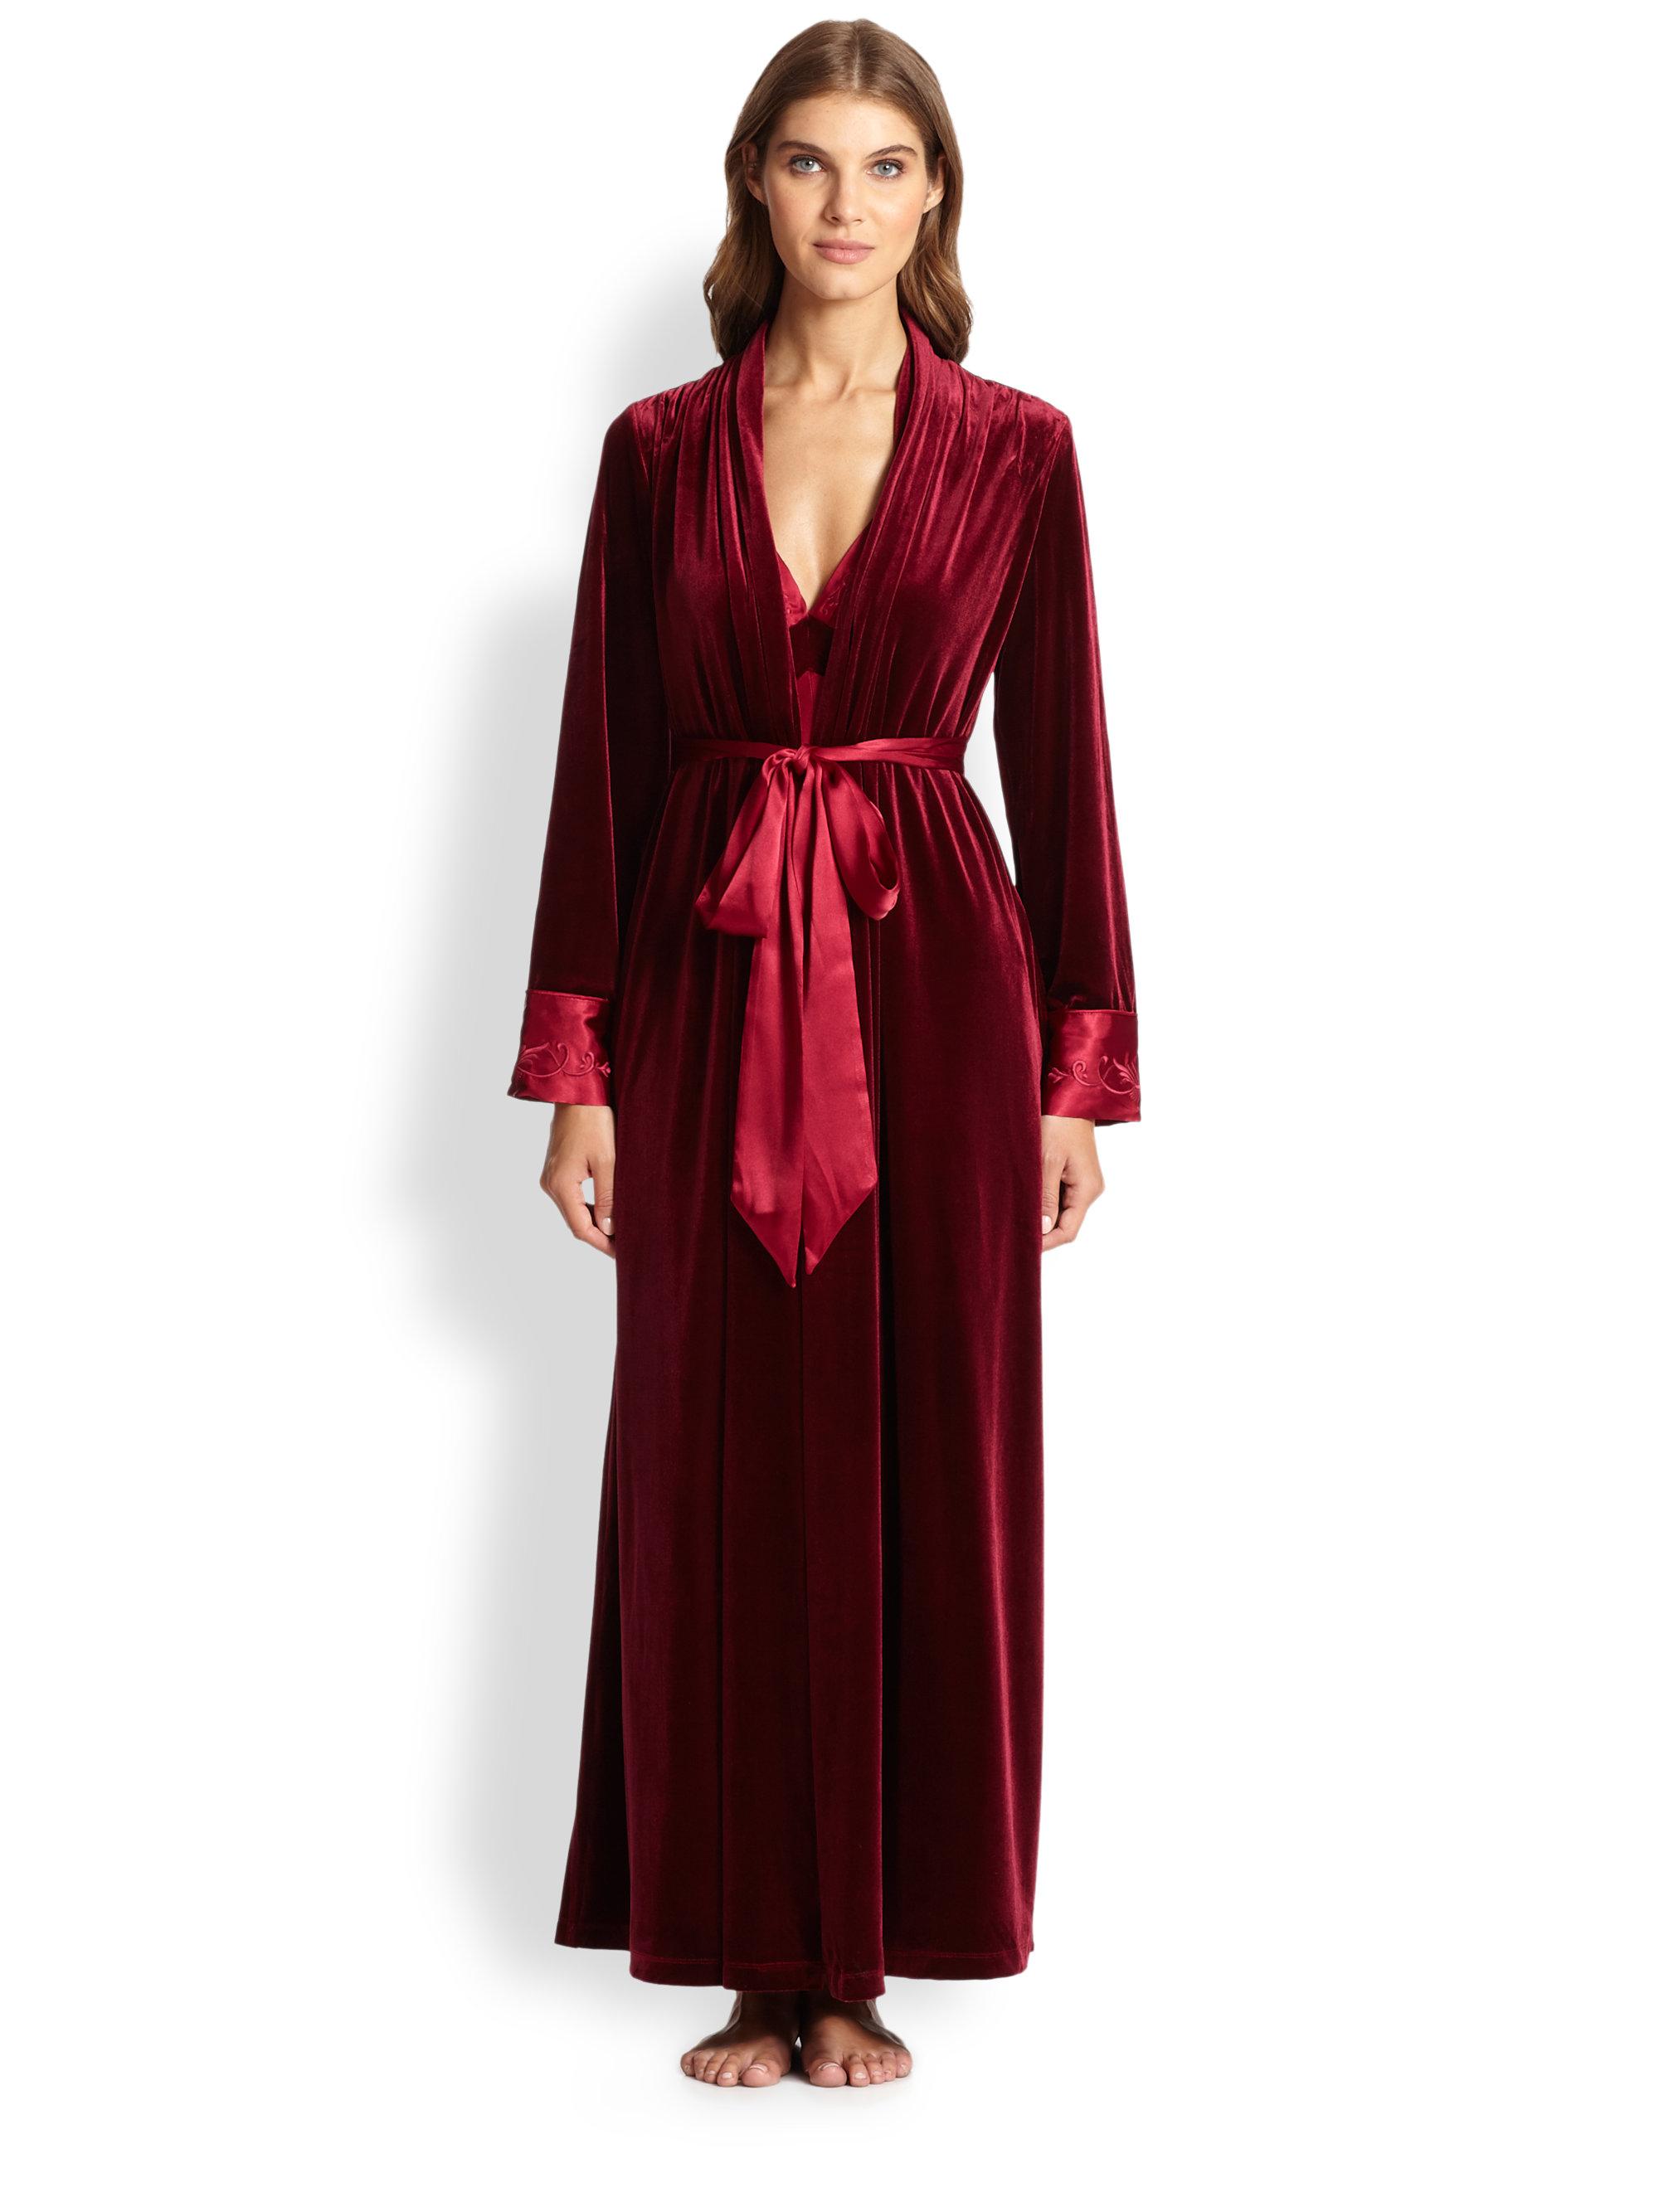 Red Silk Robe Short Kimono Silk Robe Pure Silk Lingerie | Etsy |Red Silk Robe